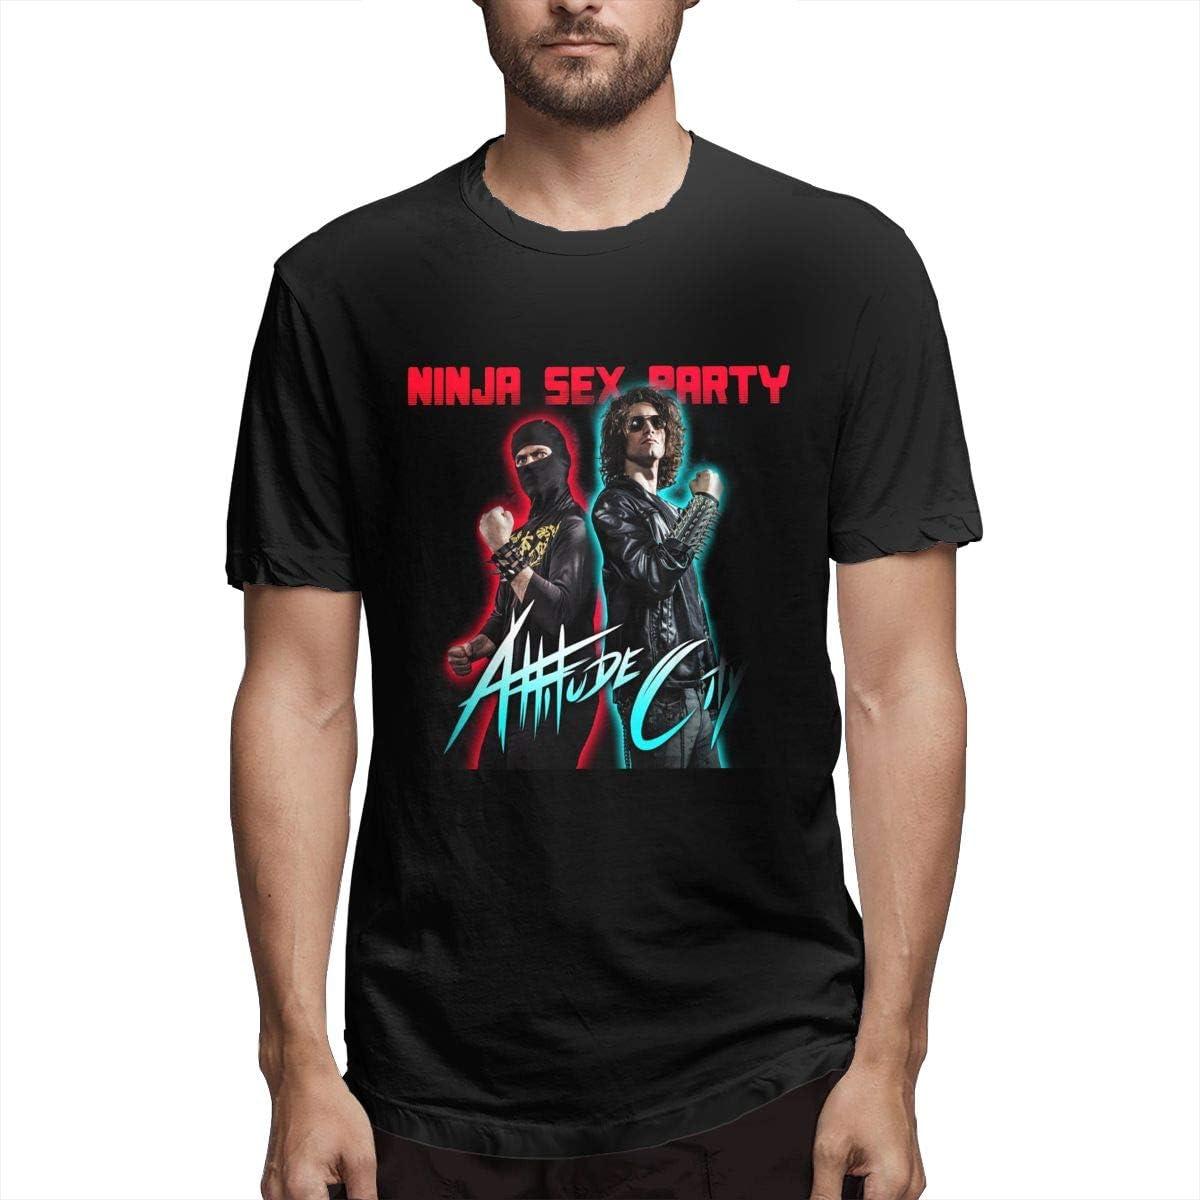 Ninja Sex Party T Shirt Men's Cool Short Sleeves Round Neck T Shirts